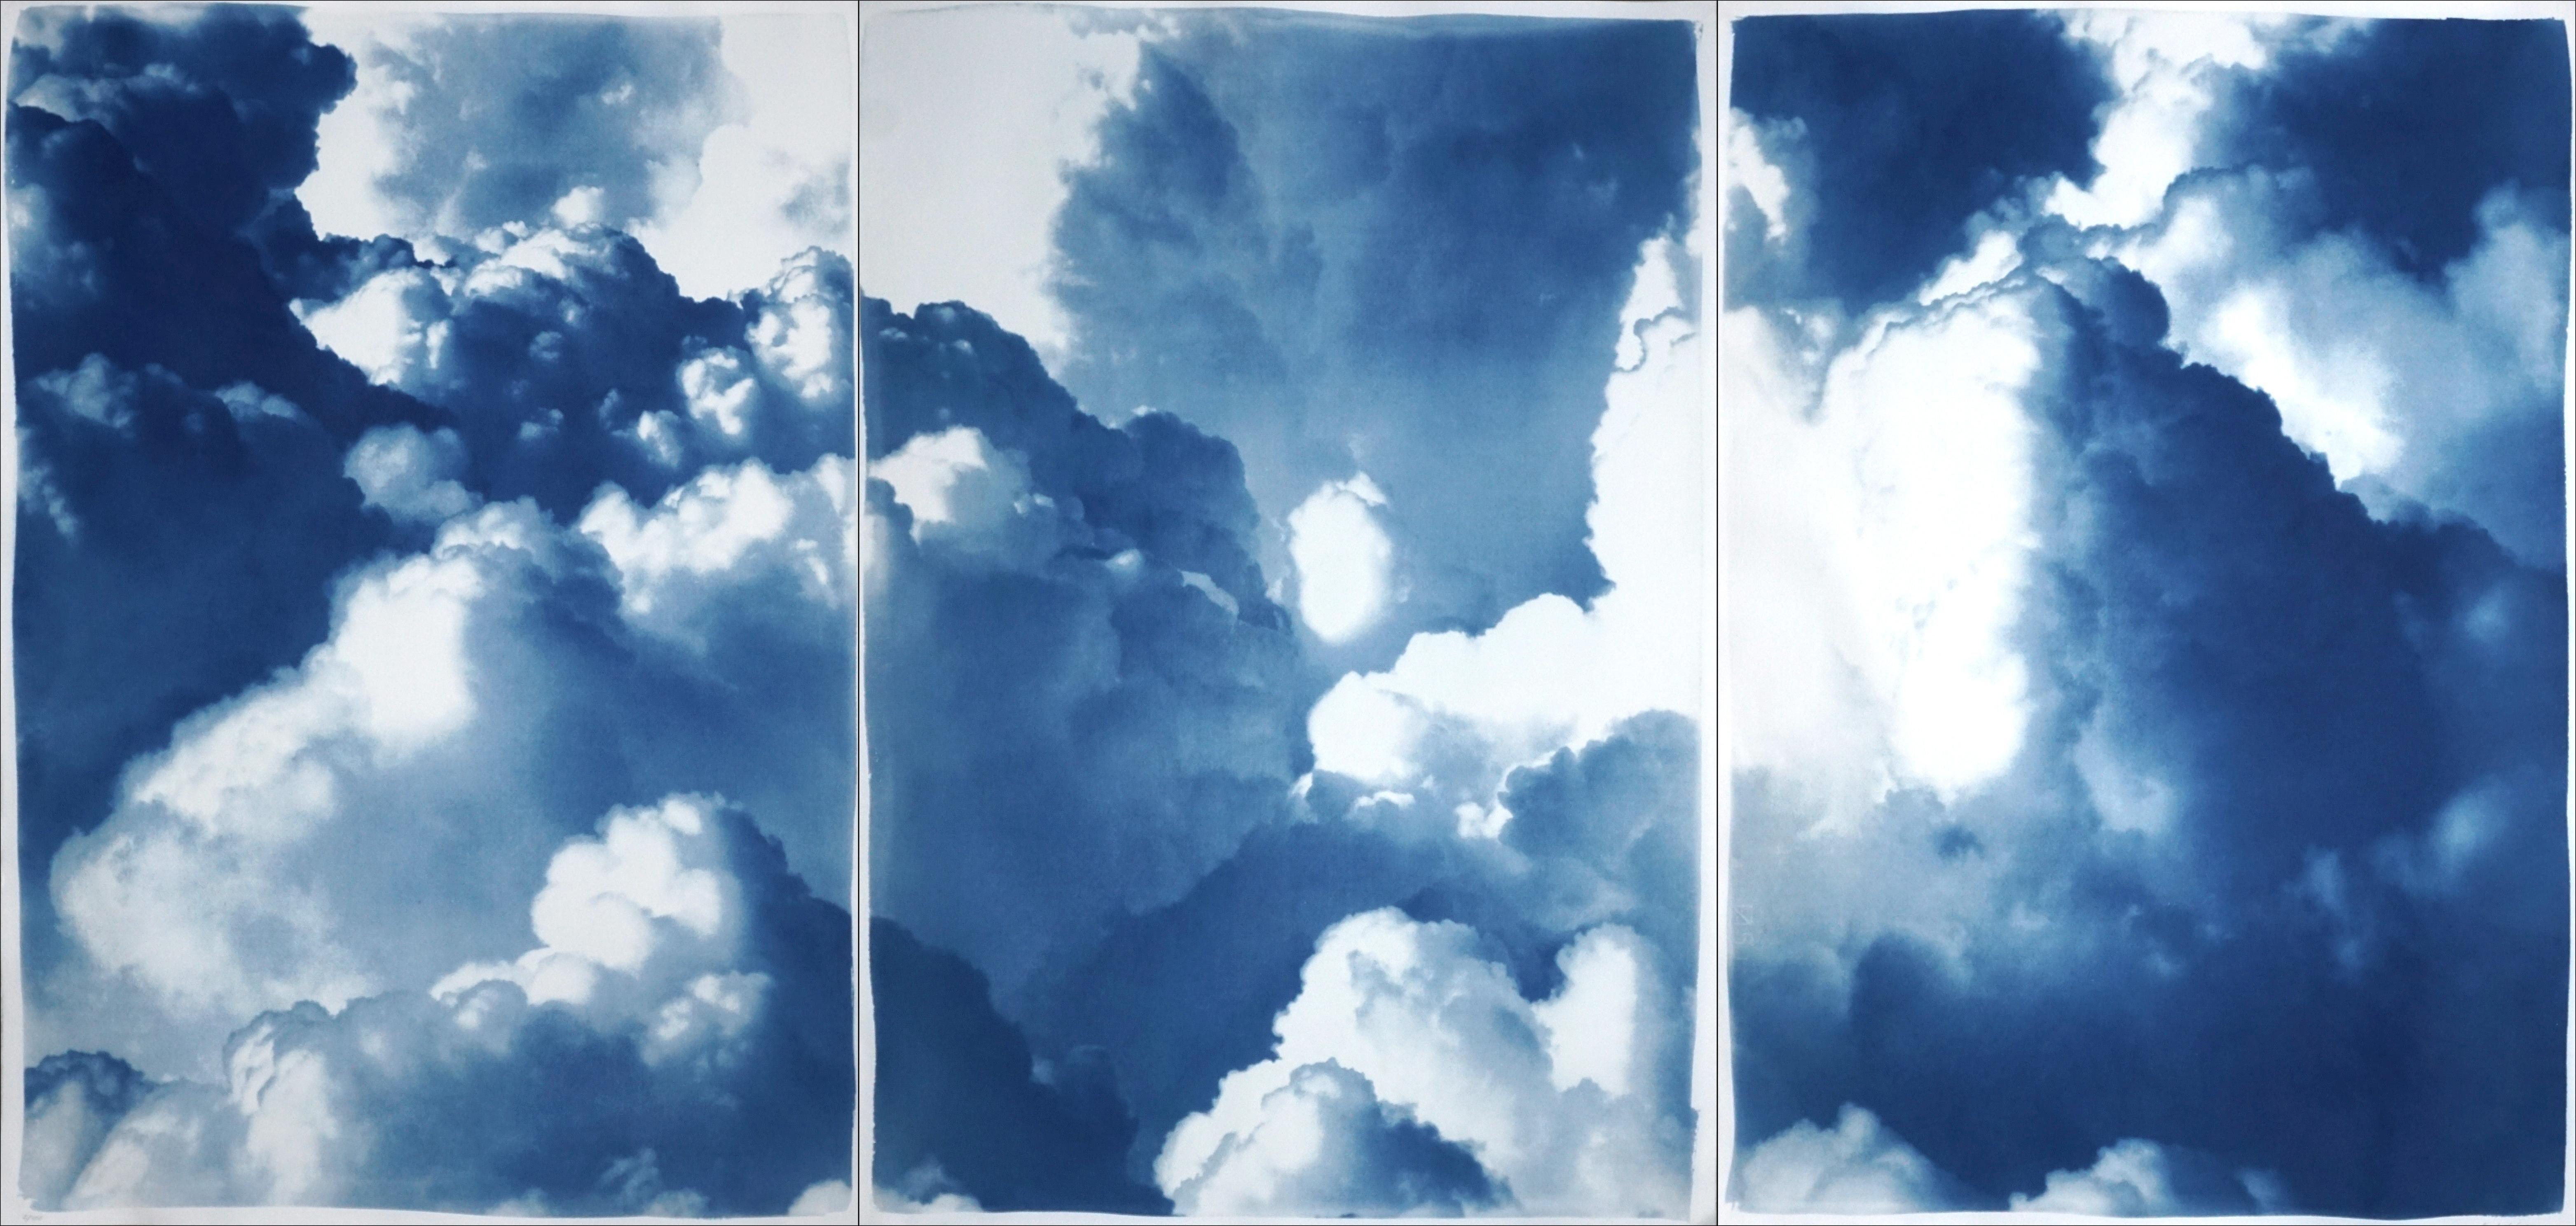 Dense Rolling Clouds, Blue Sky Landscape Triptych, Handmade Cyanotype on Paper